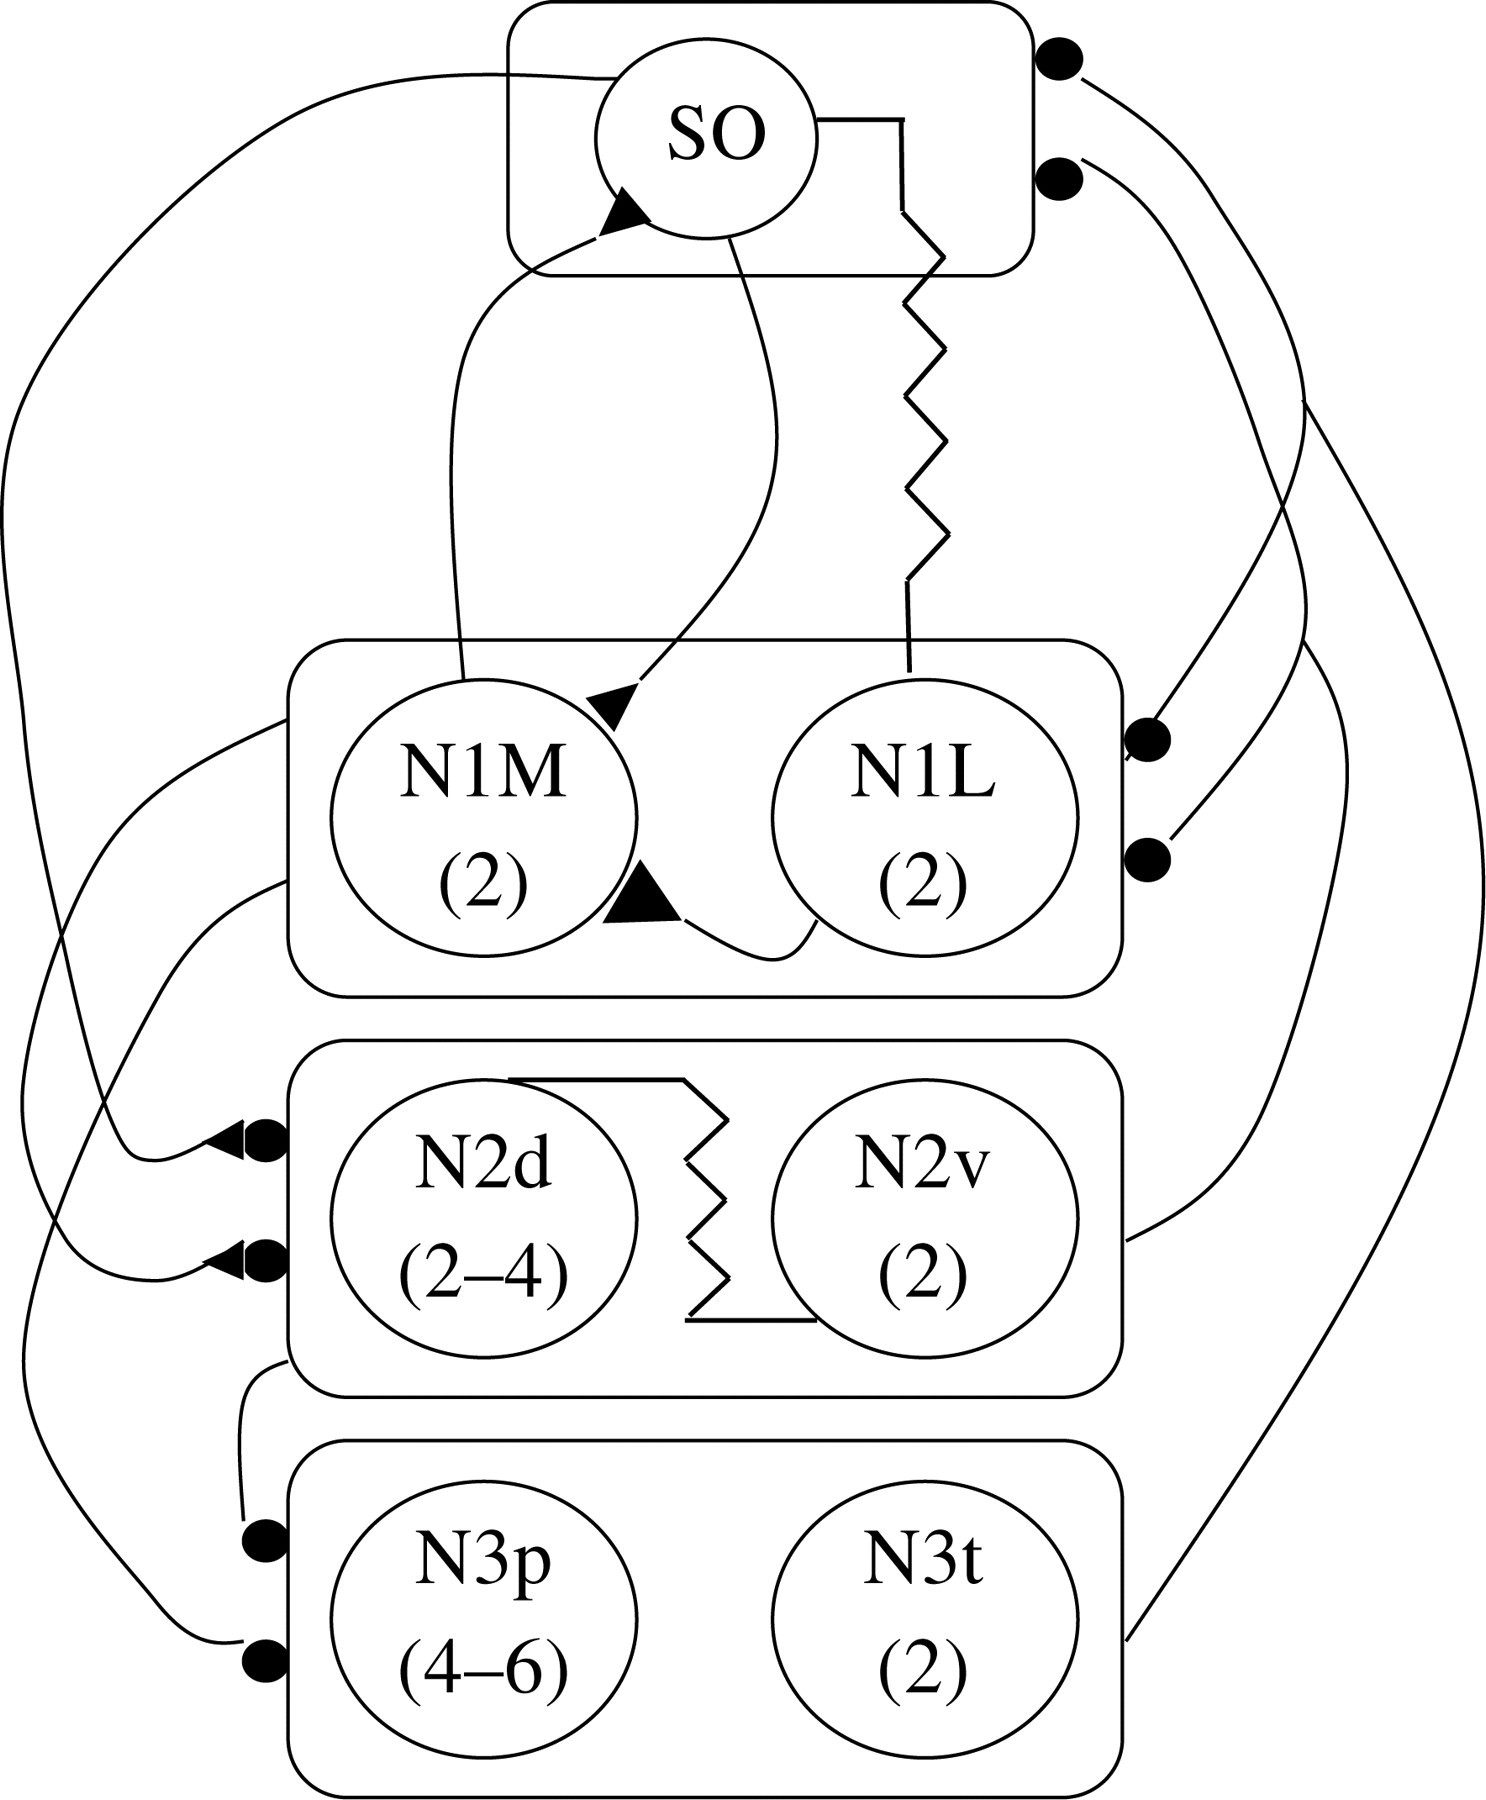 Invertebrate Central Pattern Generator Circuits